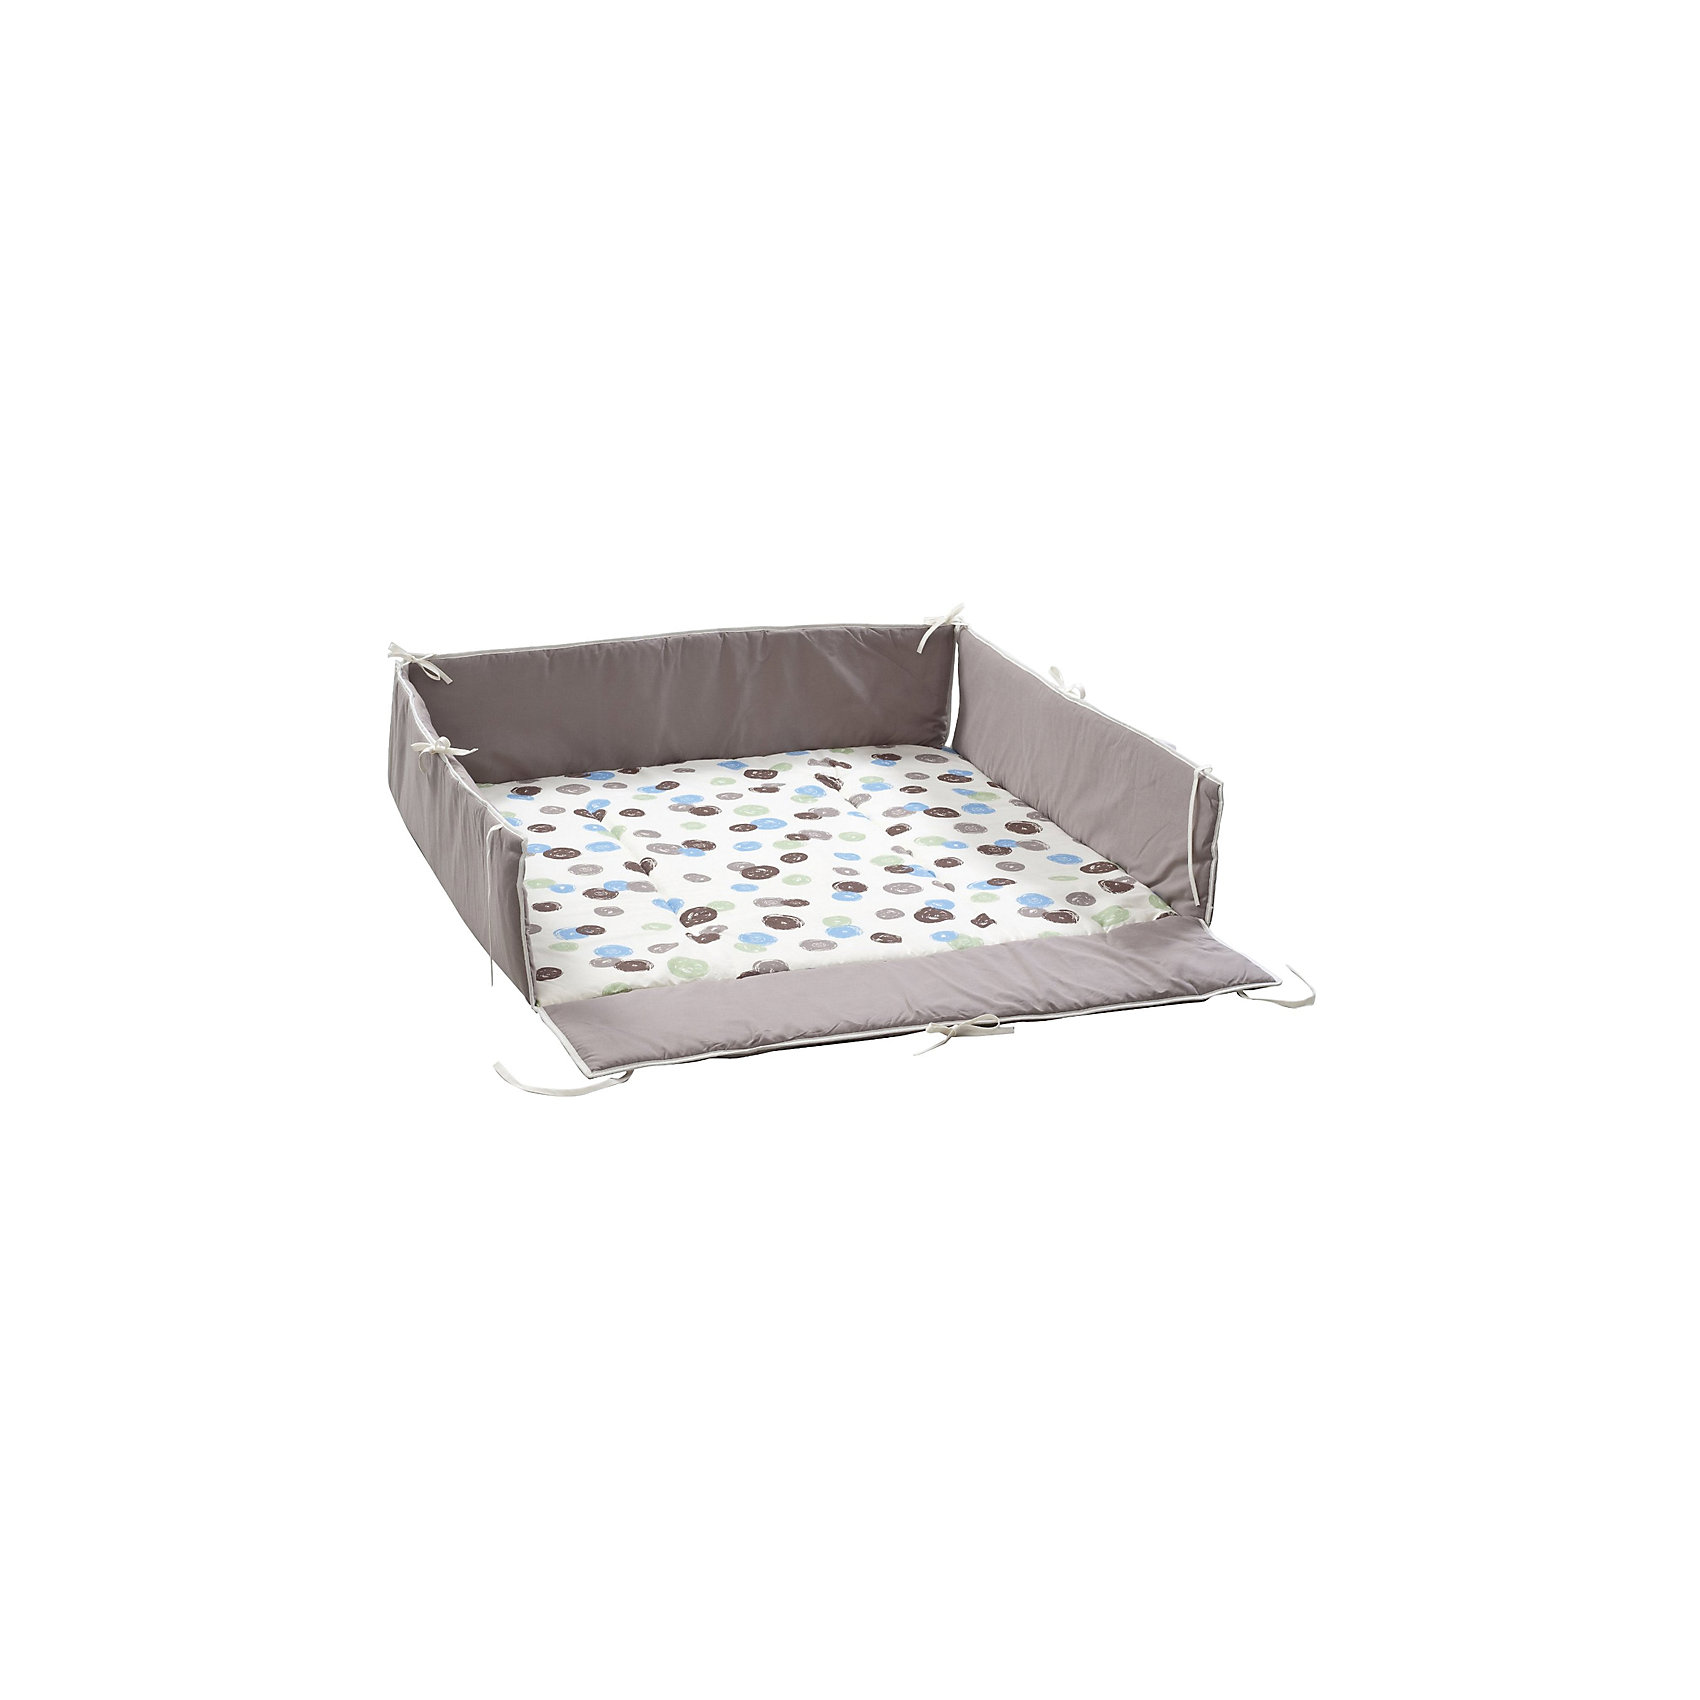 Geuther Бампер, простыня для кровати-манеж Lucilee, Geuther аксессуары для мебели geuther матрас для манежа lucilee